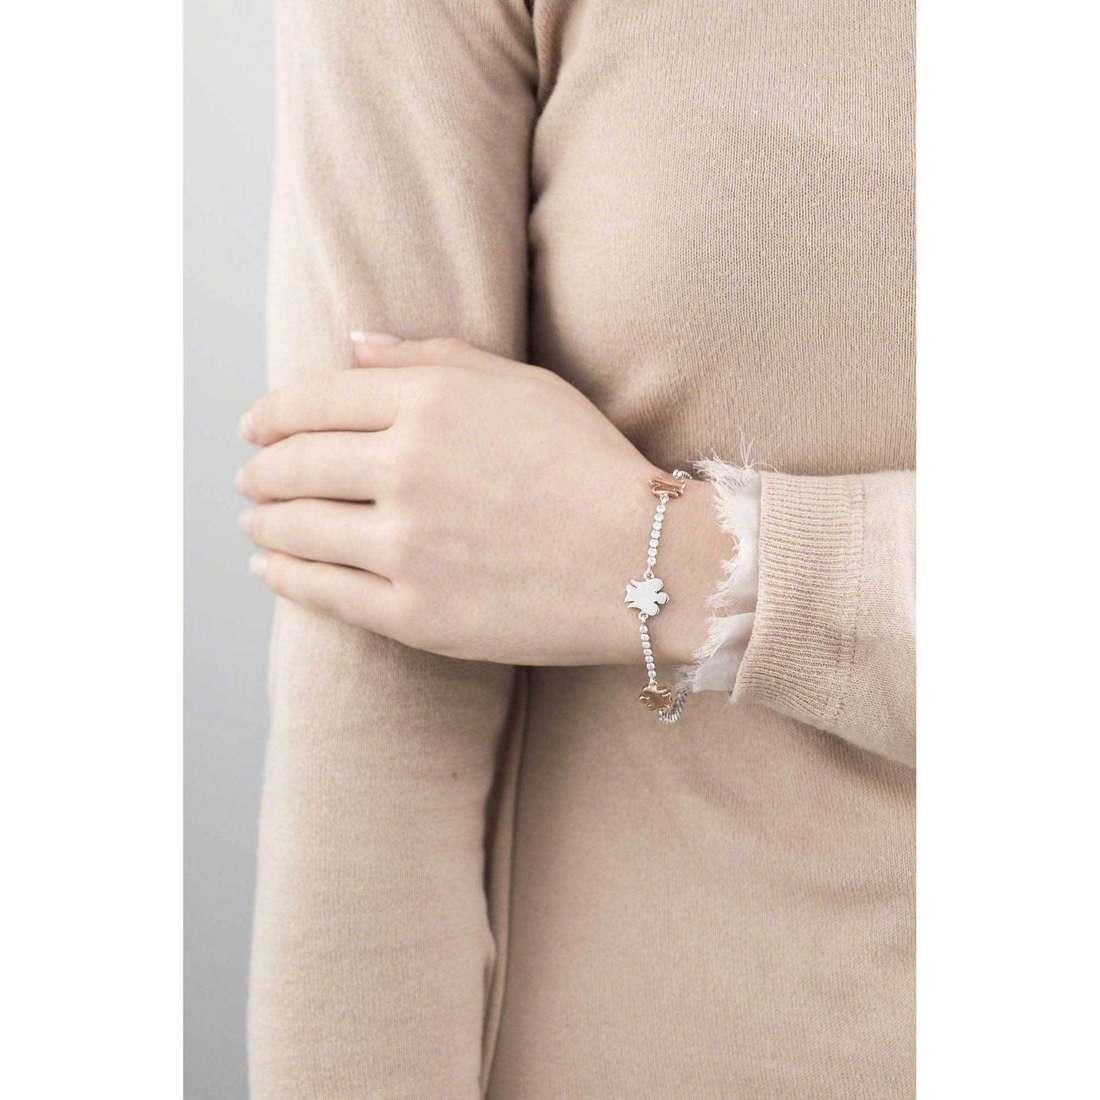 Giannotti bracelets Chiama Angeli femme GIA247 indosso